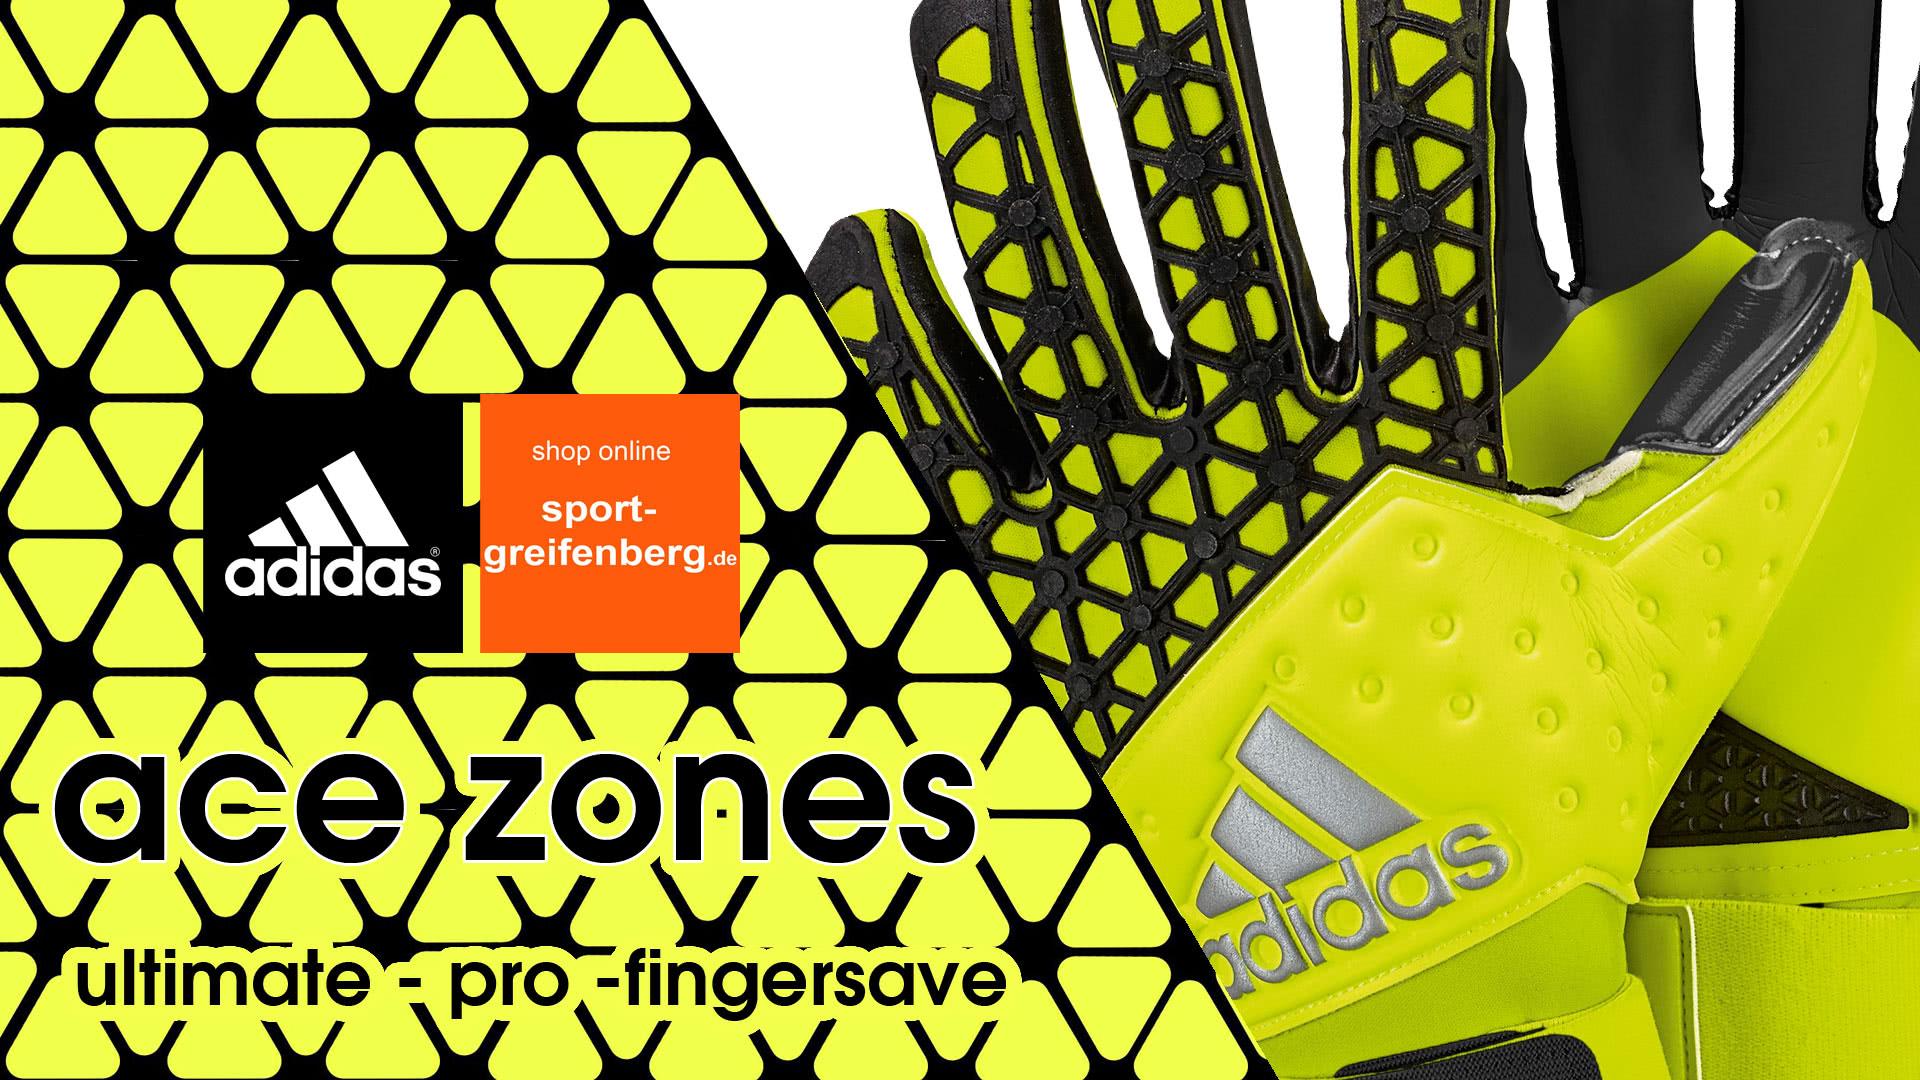 Adidas Ace Zones Pro